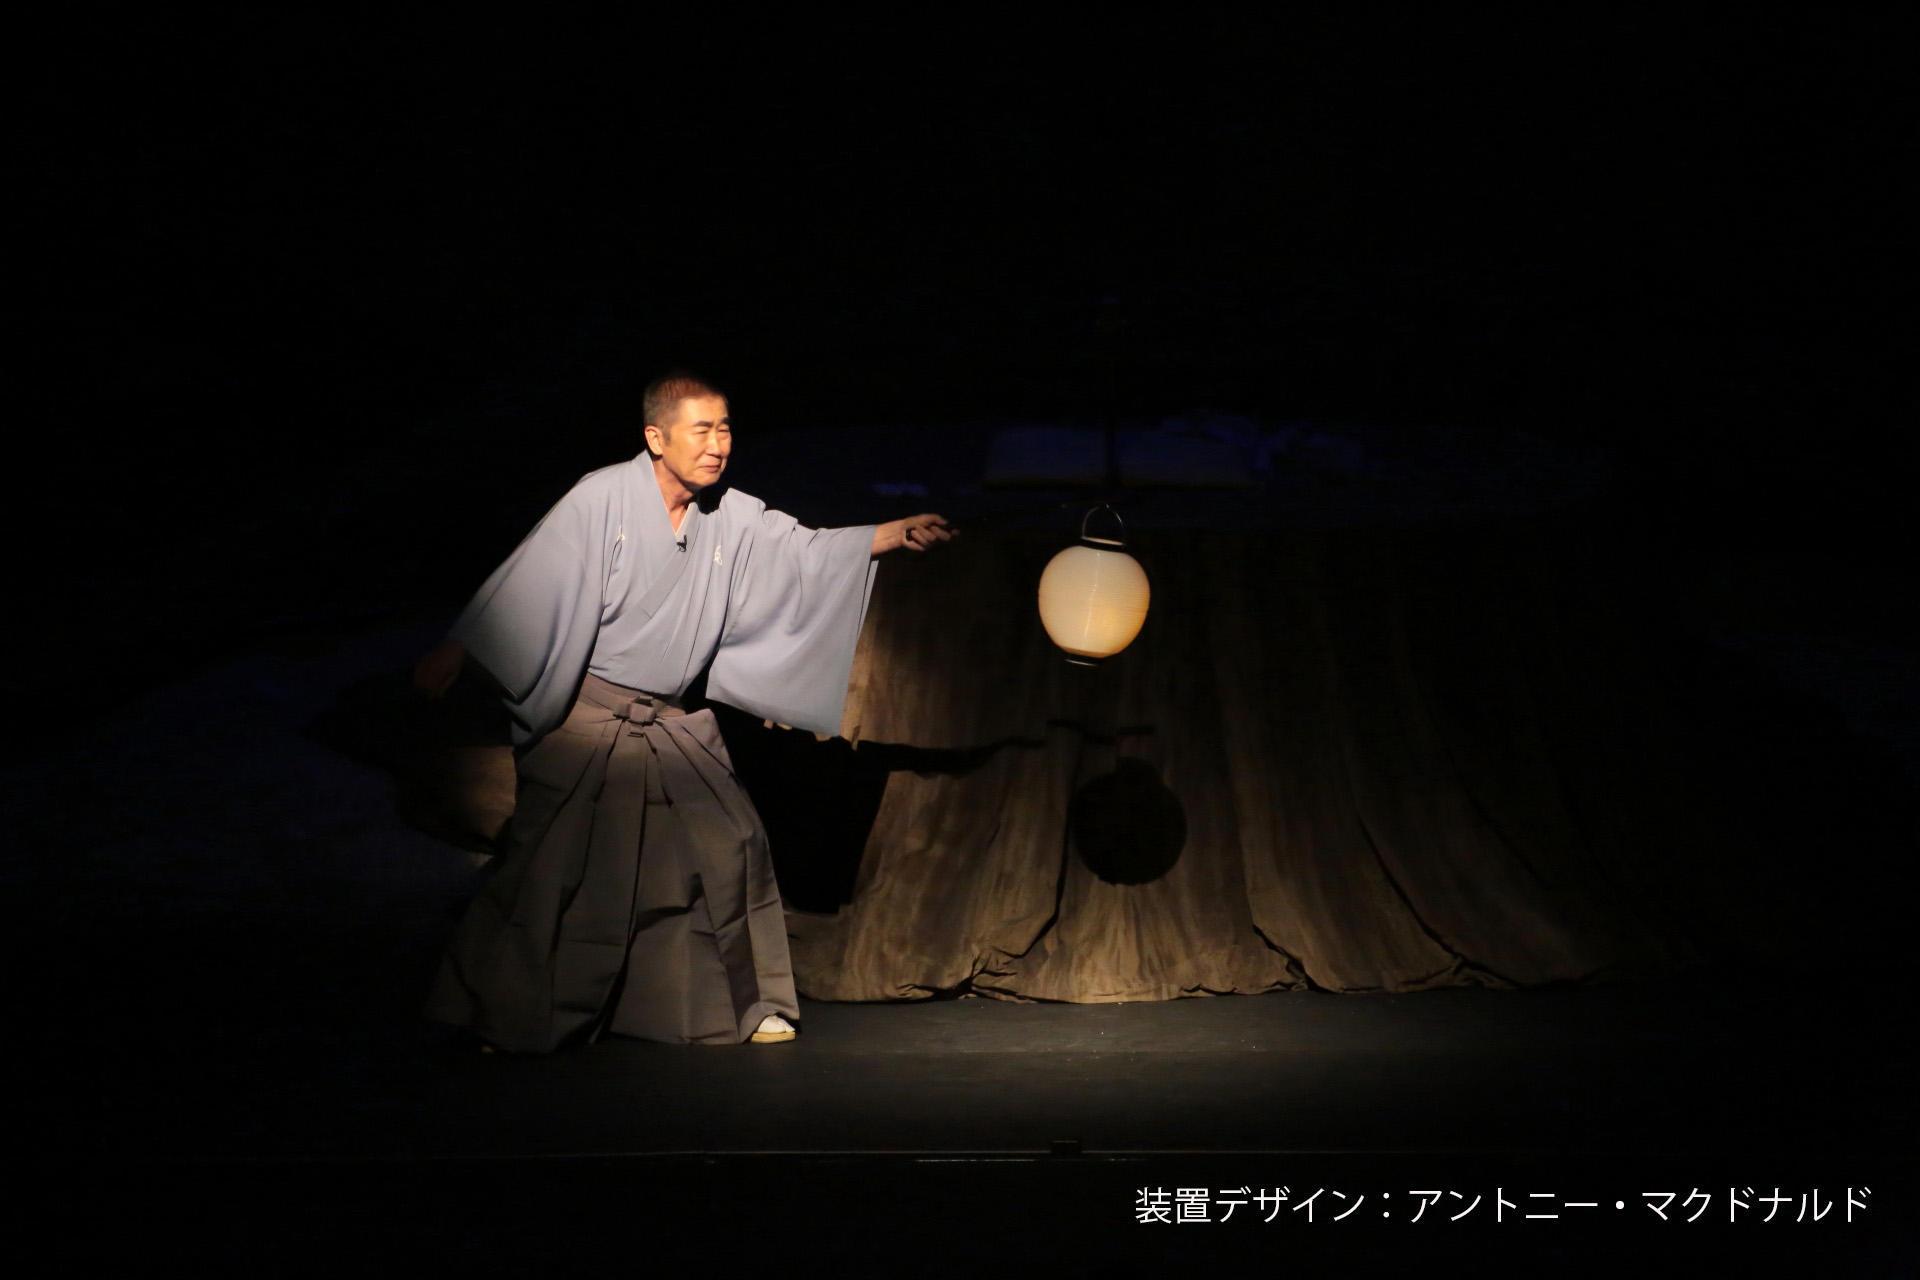 http://news.yoshimoto.co.jp/20160731004213-a87a4b03c3da3401cd89652e72d226b0c0c9b83b.jpg